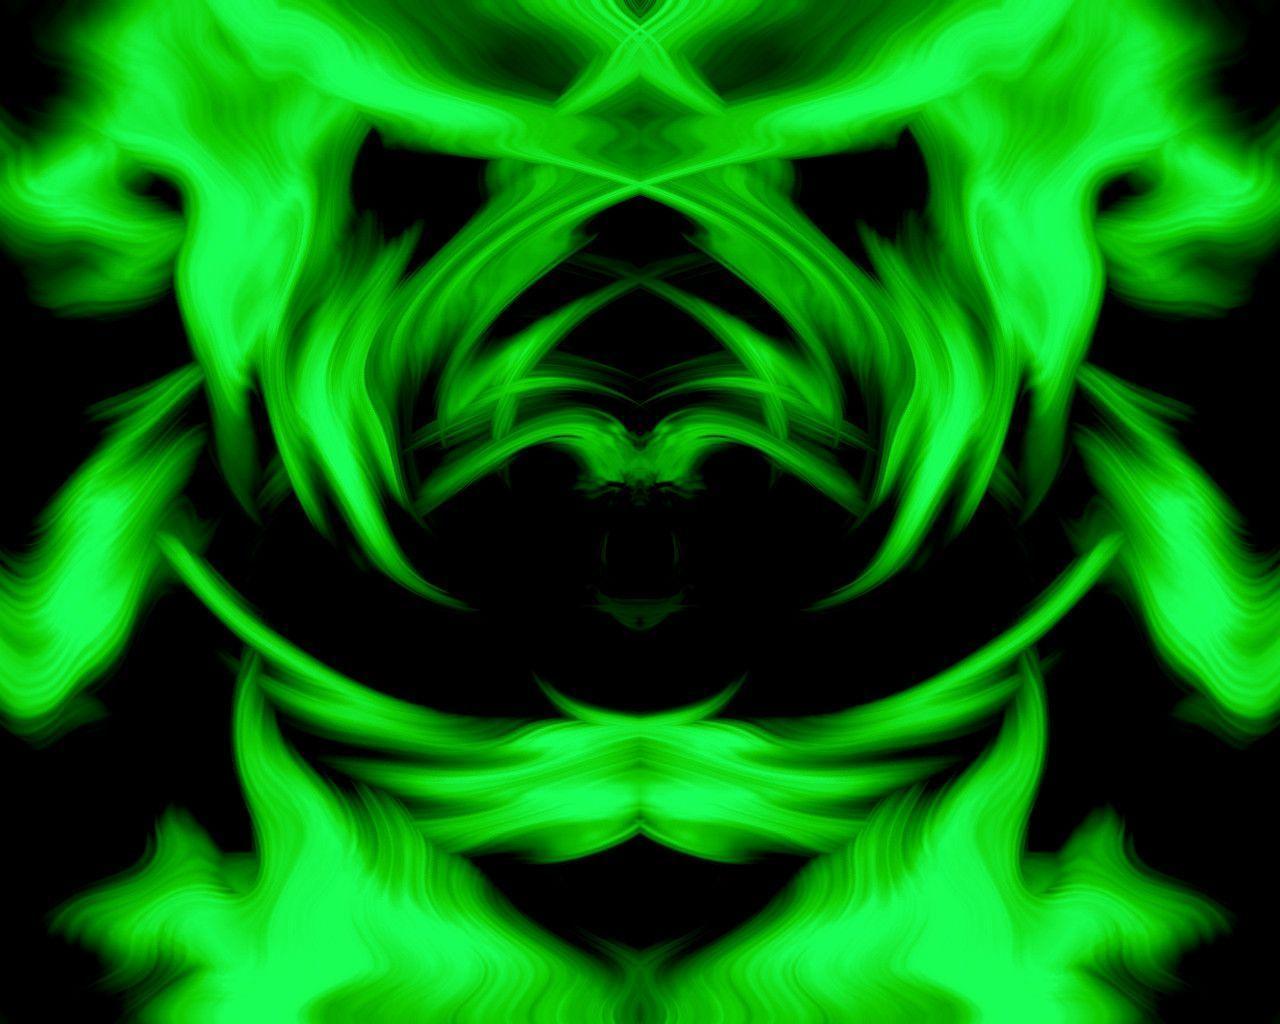 green neon background - photo #22